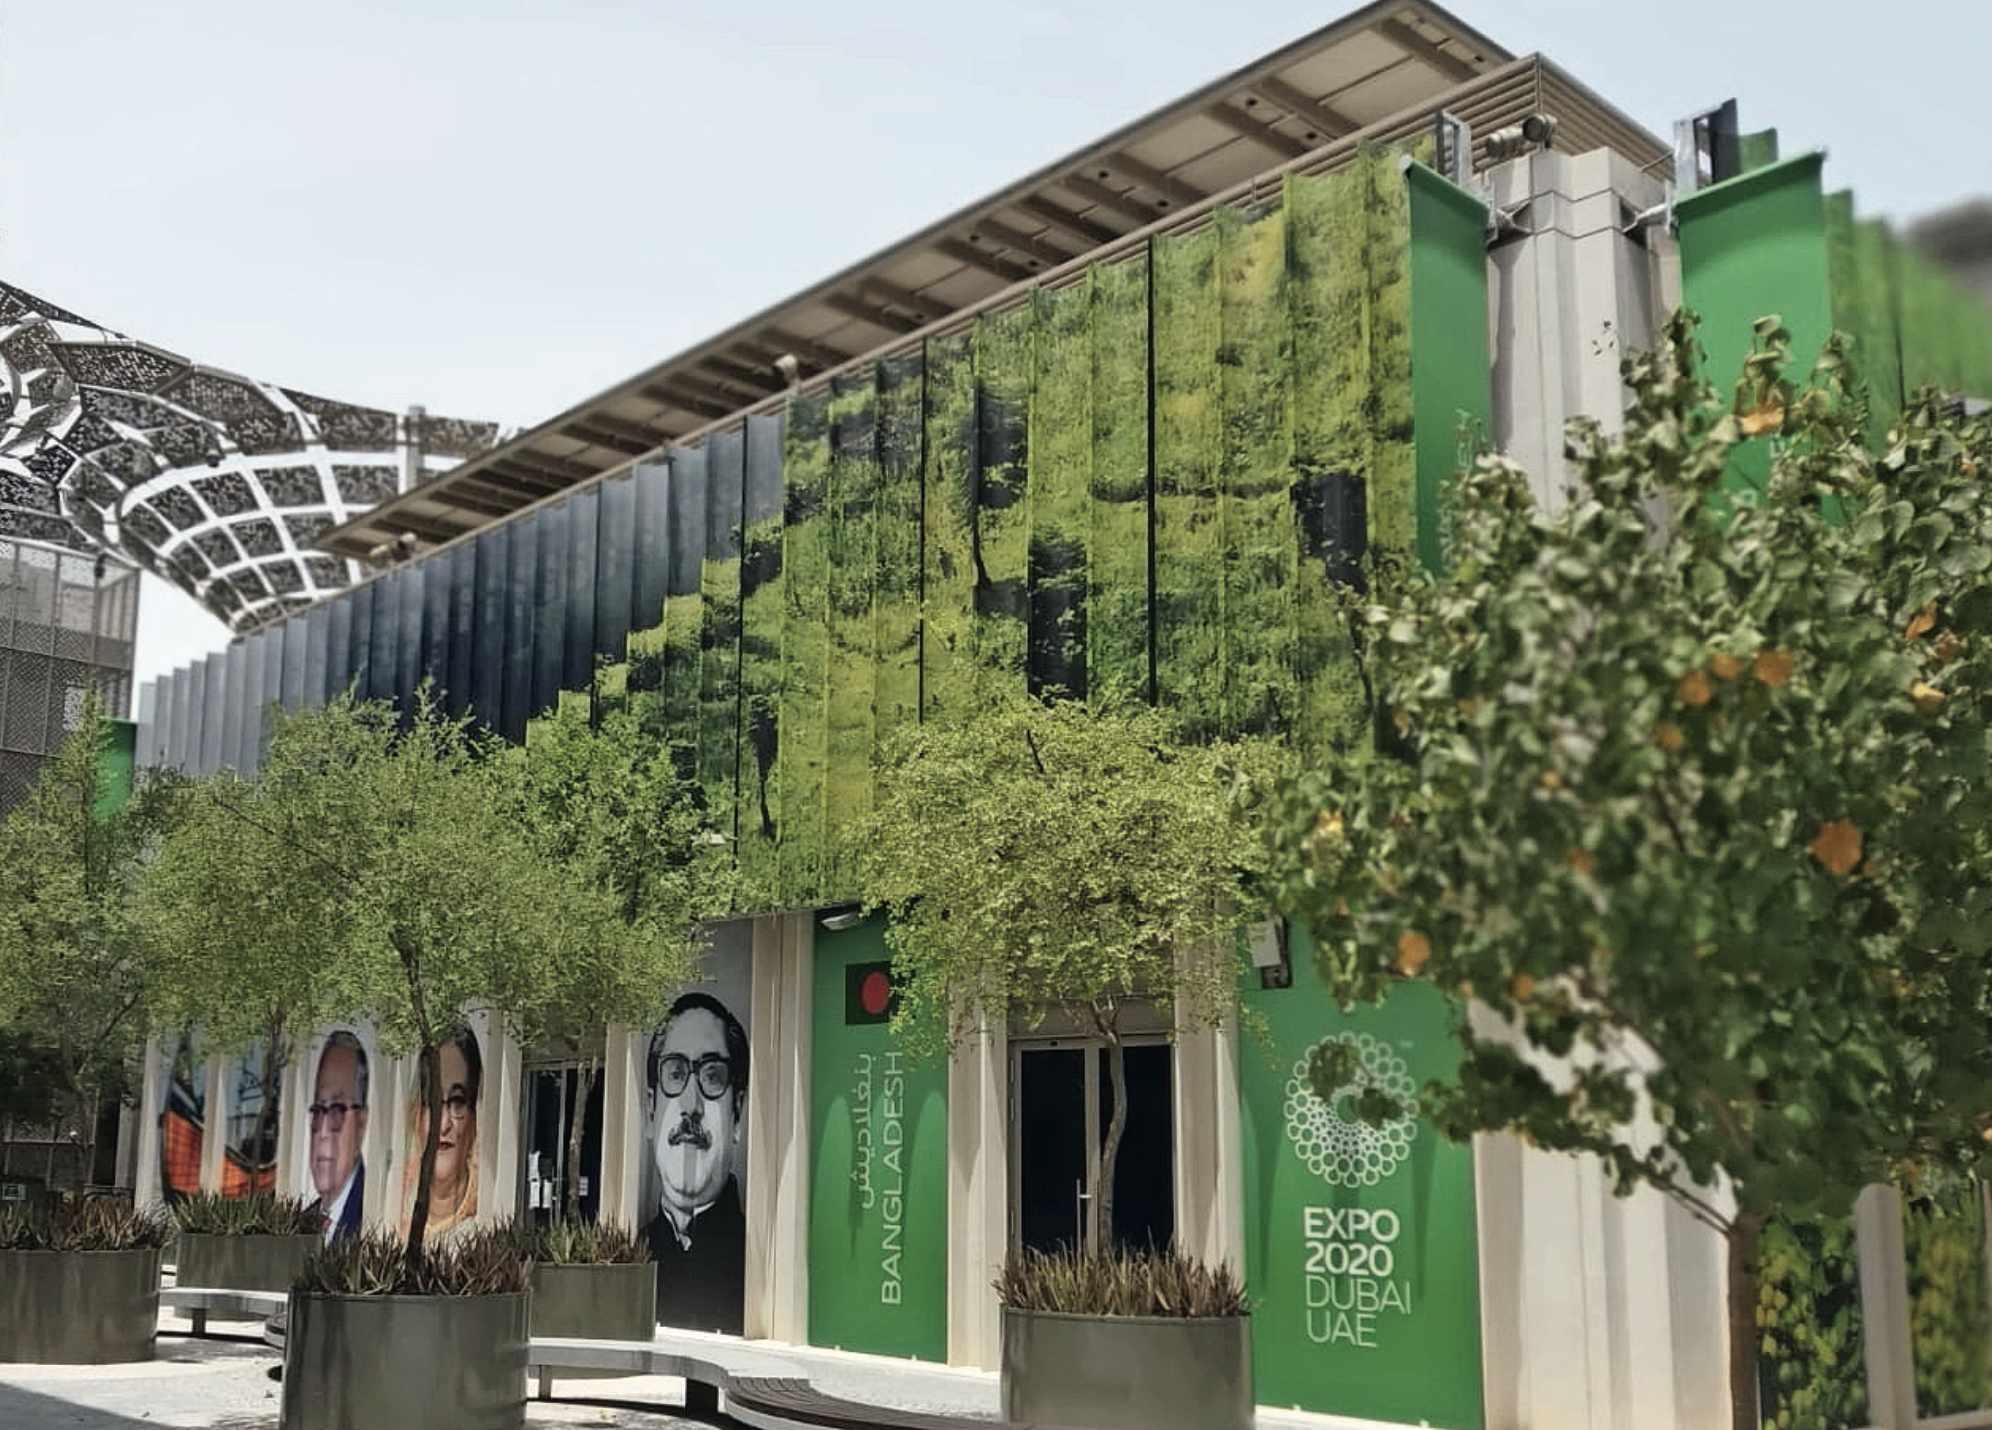 dubai expo 2020 bangladesh economic expo